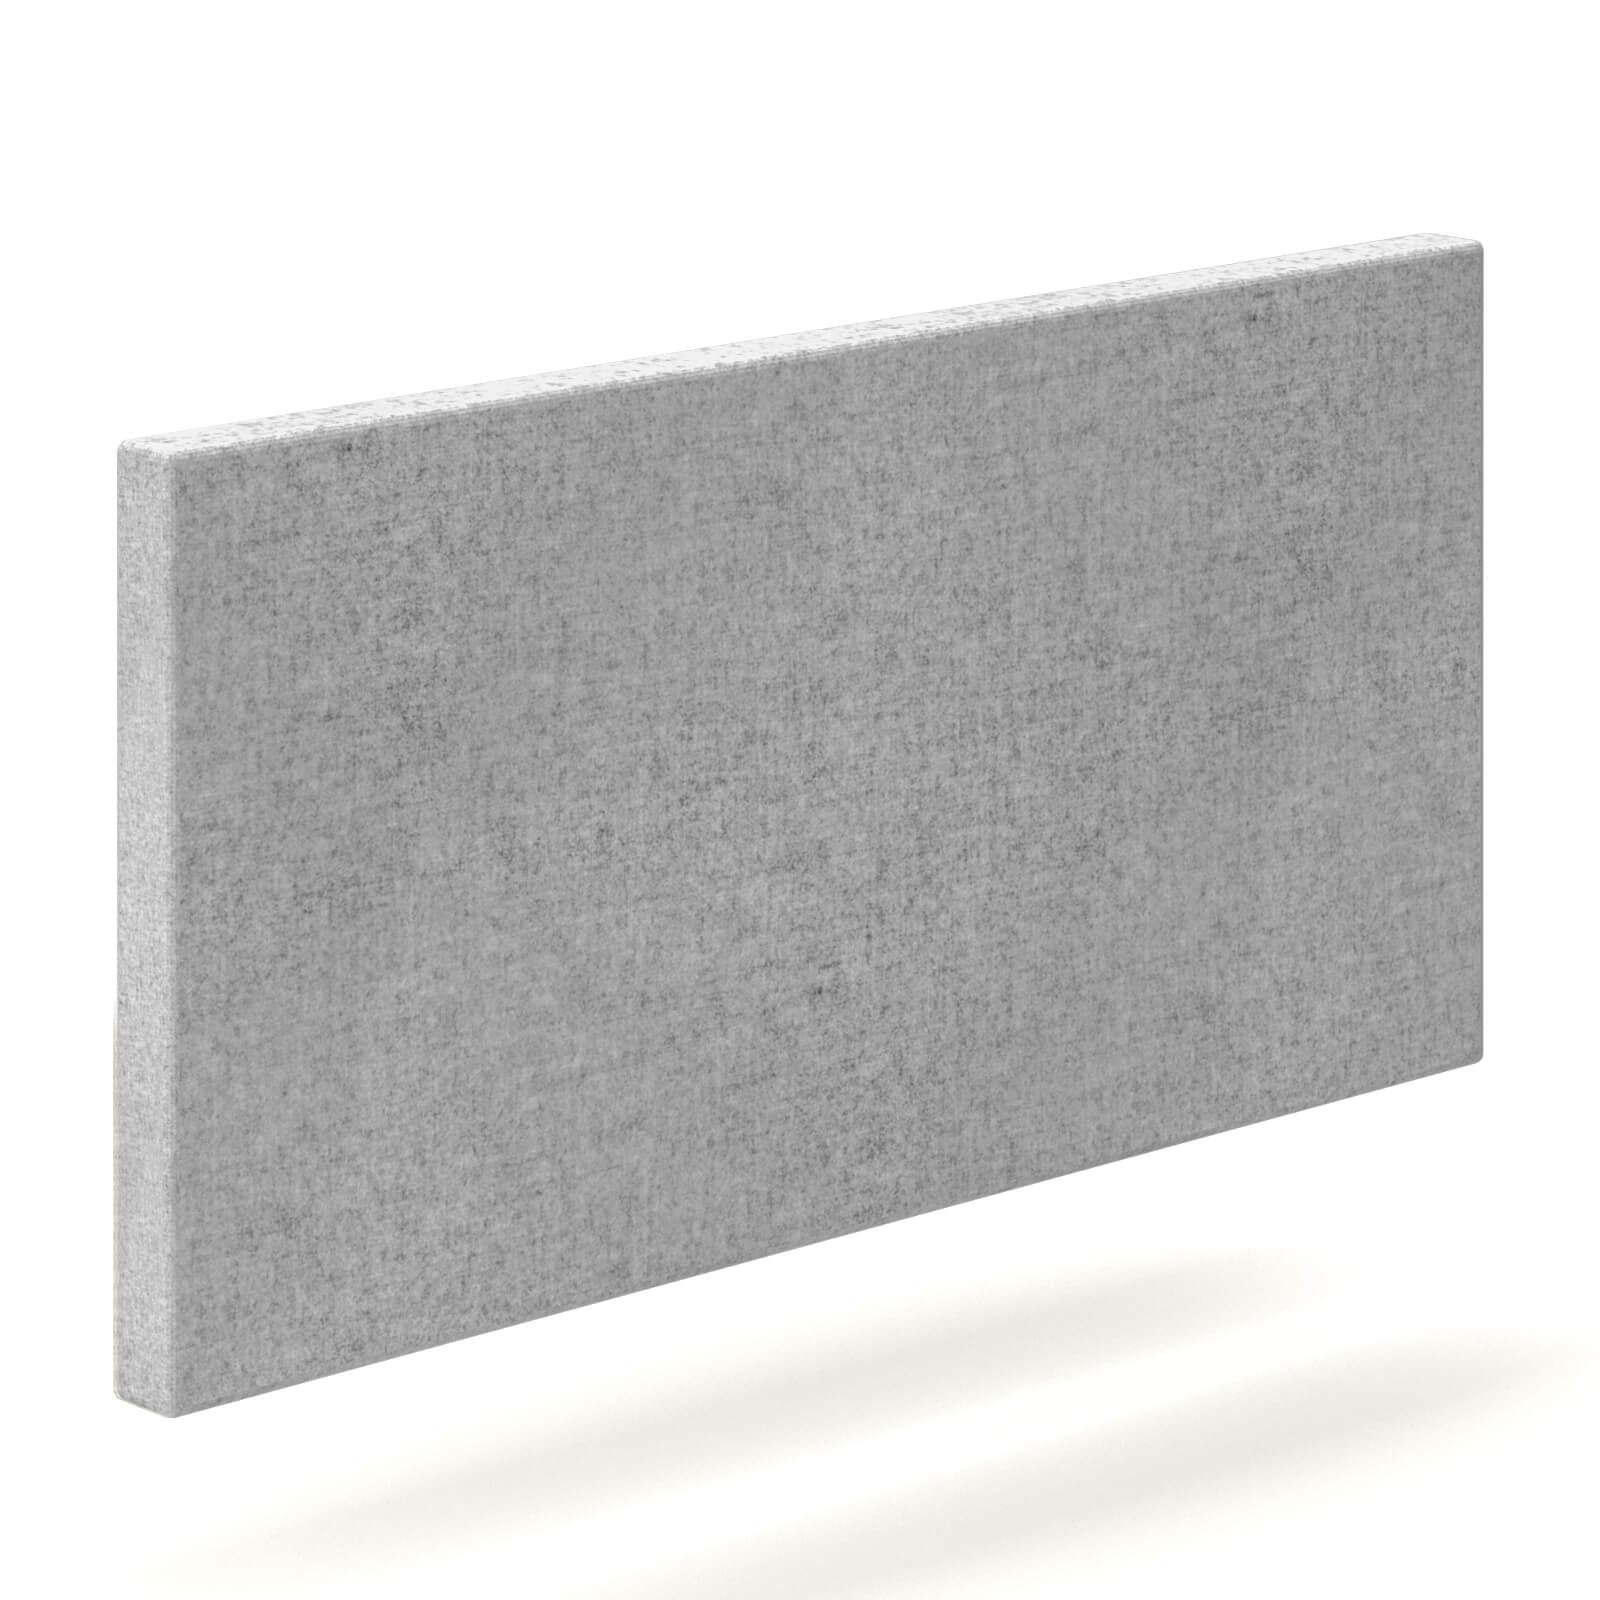 Akustik Wandverkleidung MODUS 800 x 400 mm Akustikplatten Wandpaneele Filz